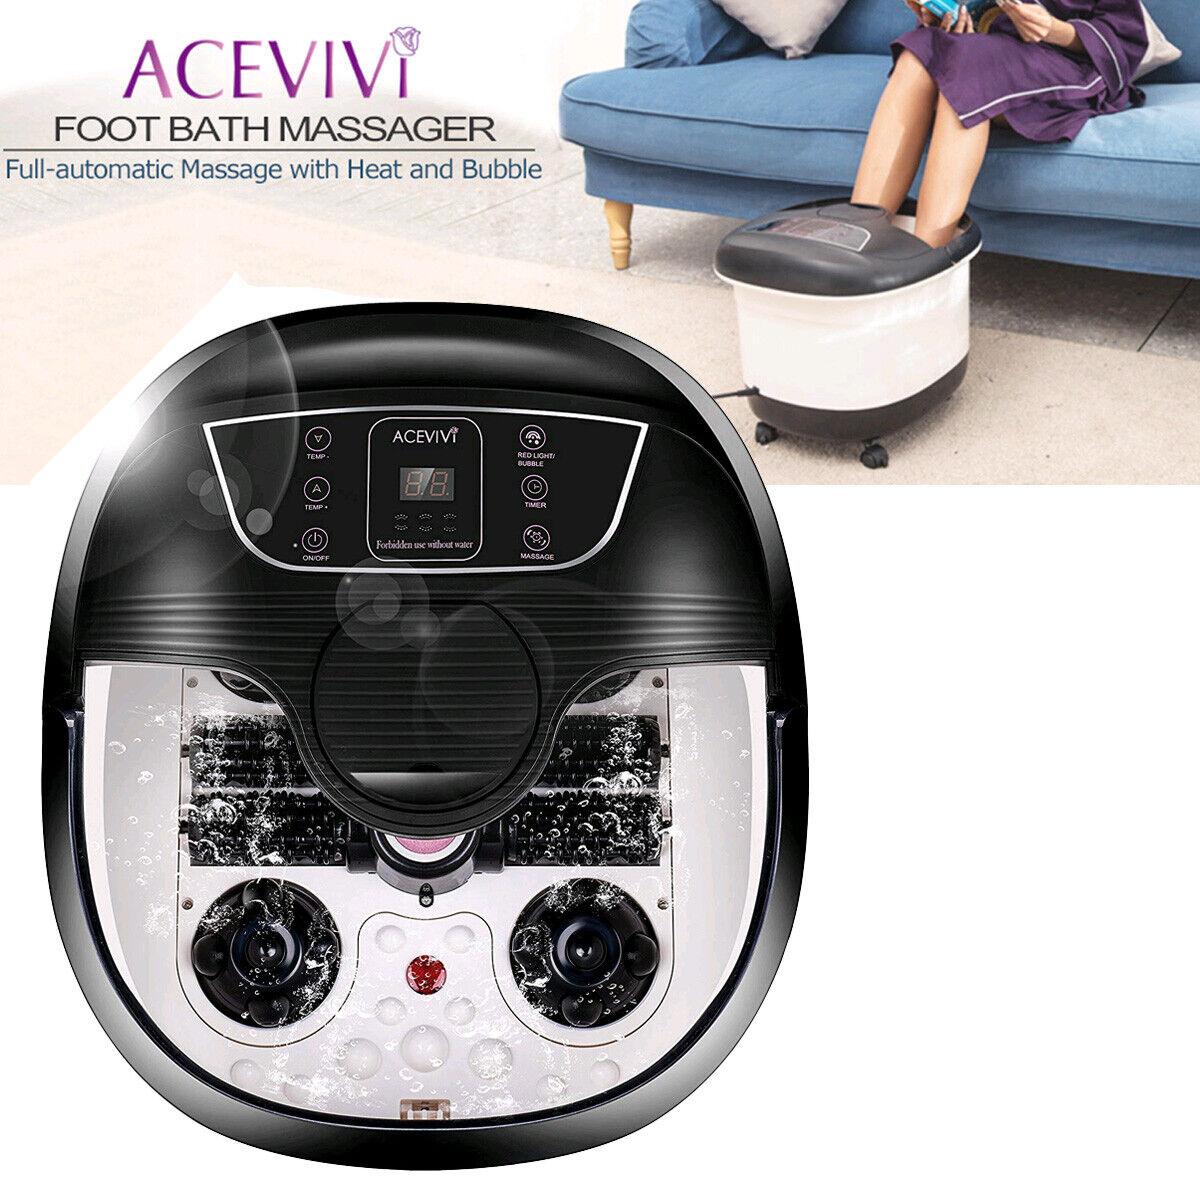 ACEVIVI Foot Spa Bath Massager Bubble Heat LED Display Shiat